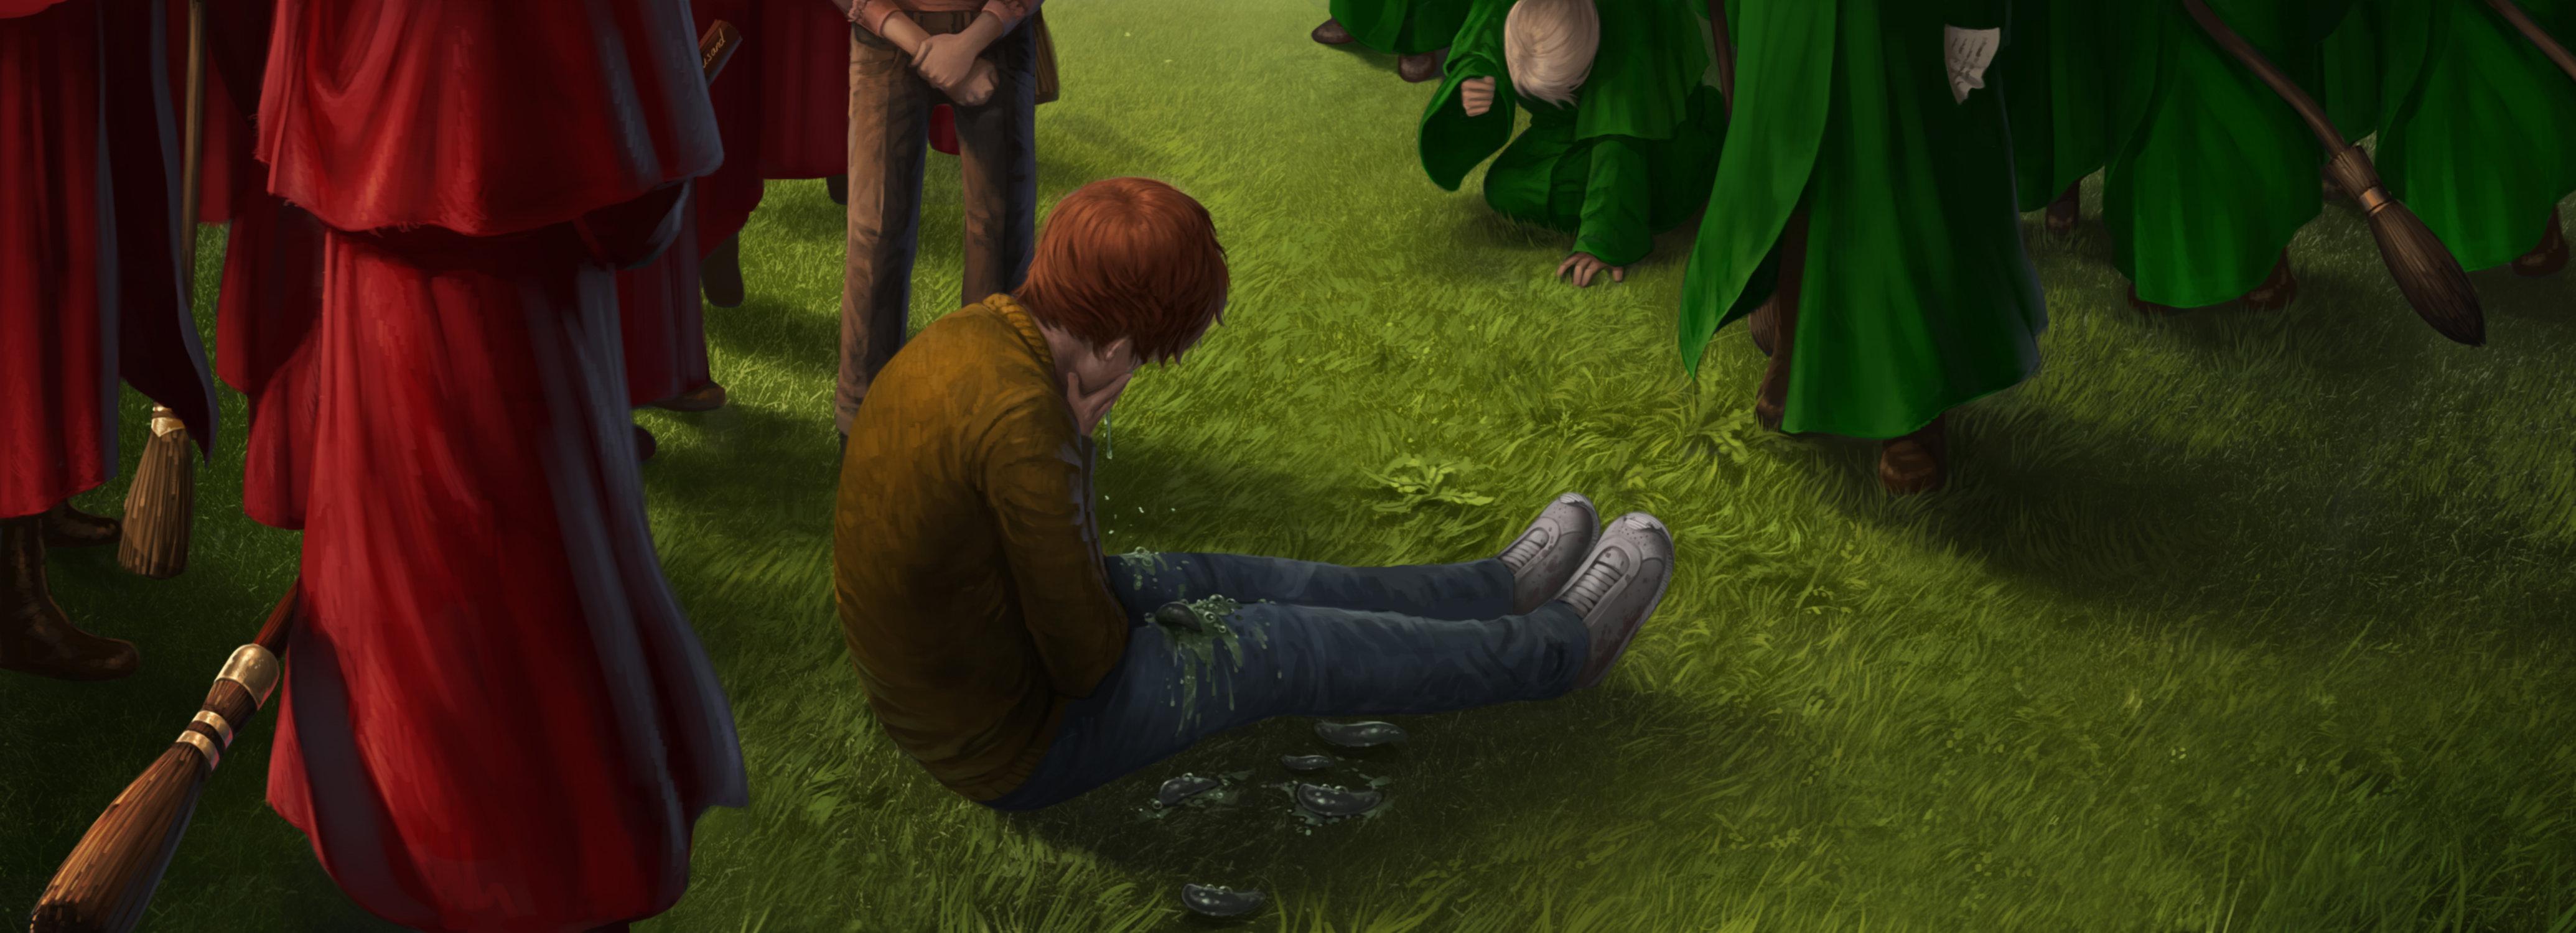 Ron vomits slugs at the Quidditch pitch.